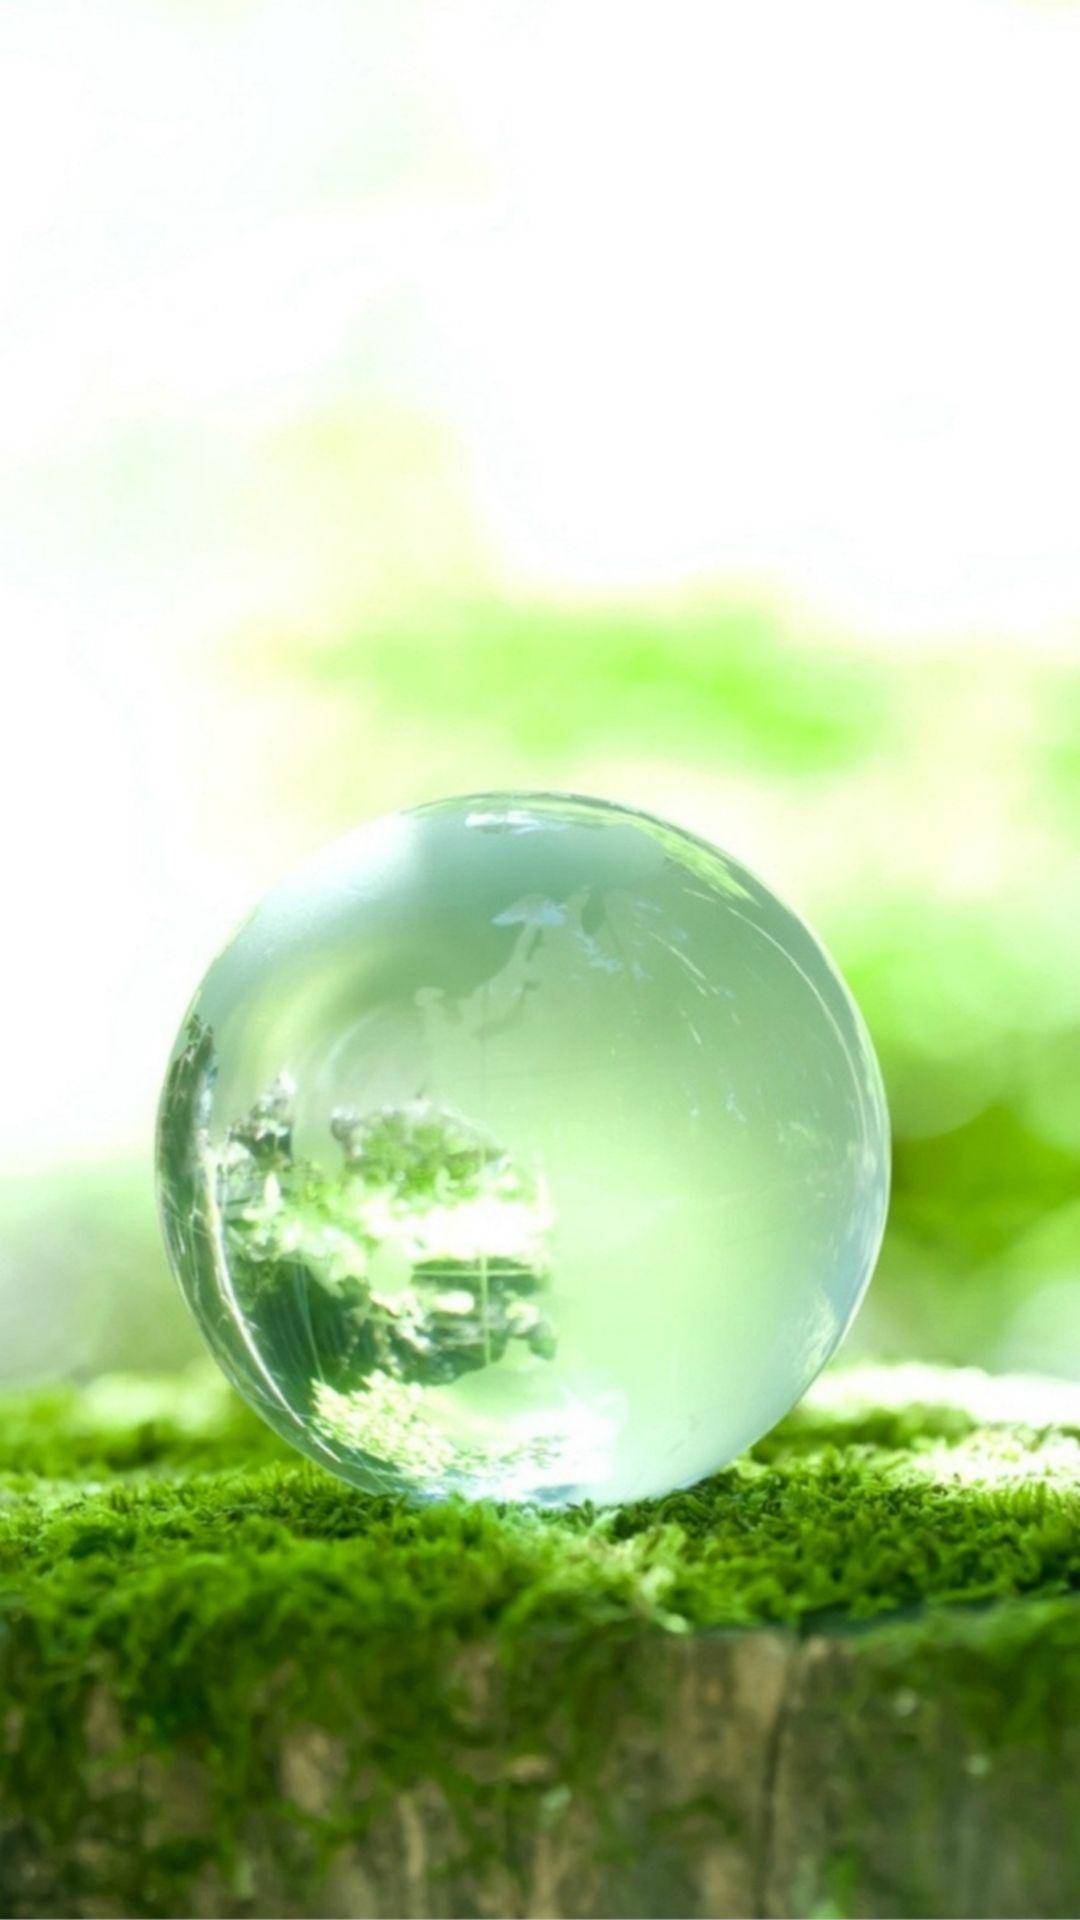 Great Wallpaper Marble Ball - 5172ac06451173d152aafc9c2b2dcaf1  Snapshot_699479.jpg